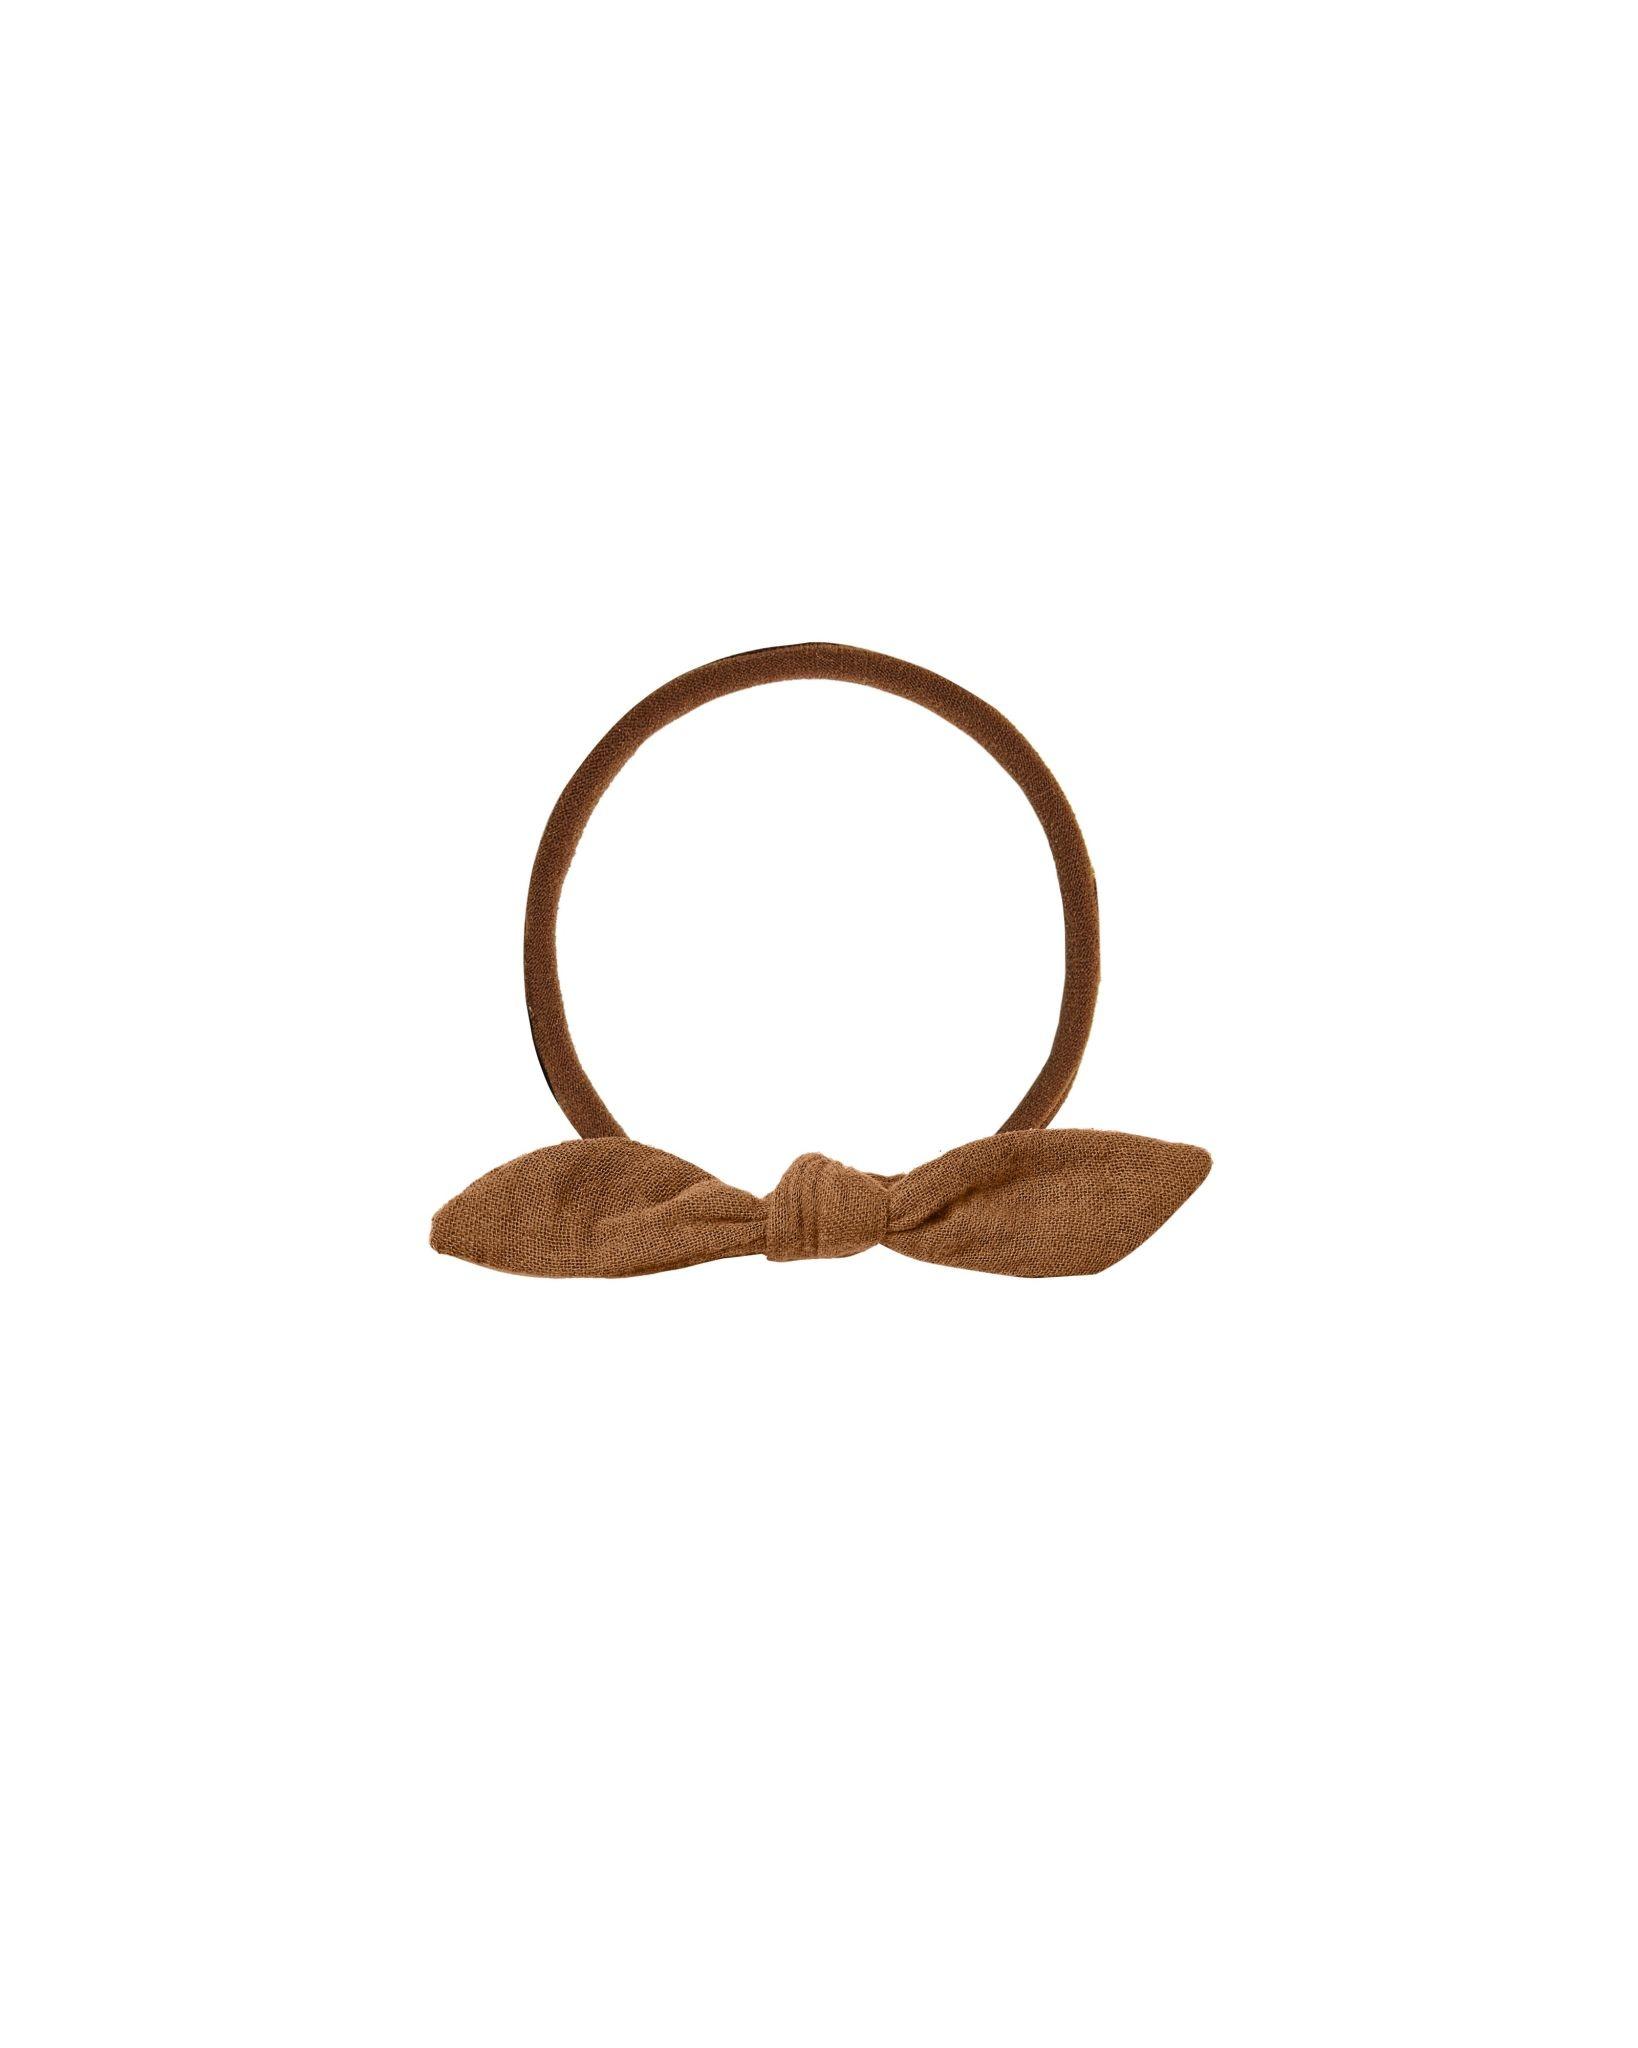 Rylee and Cru Rylee & Cru Knot Headband